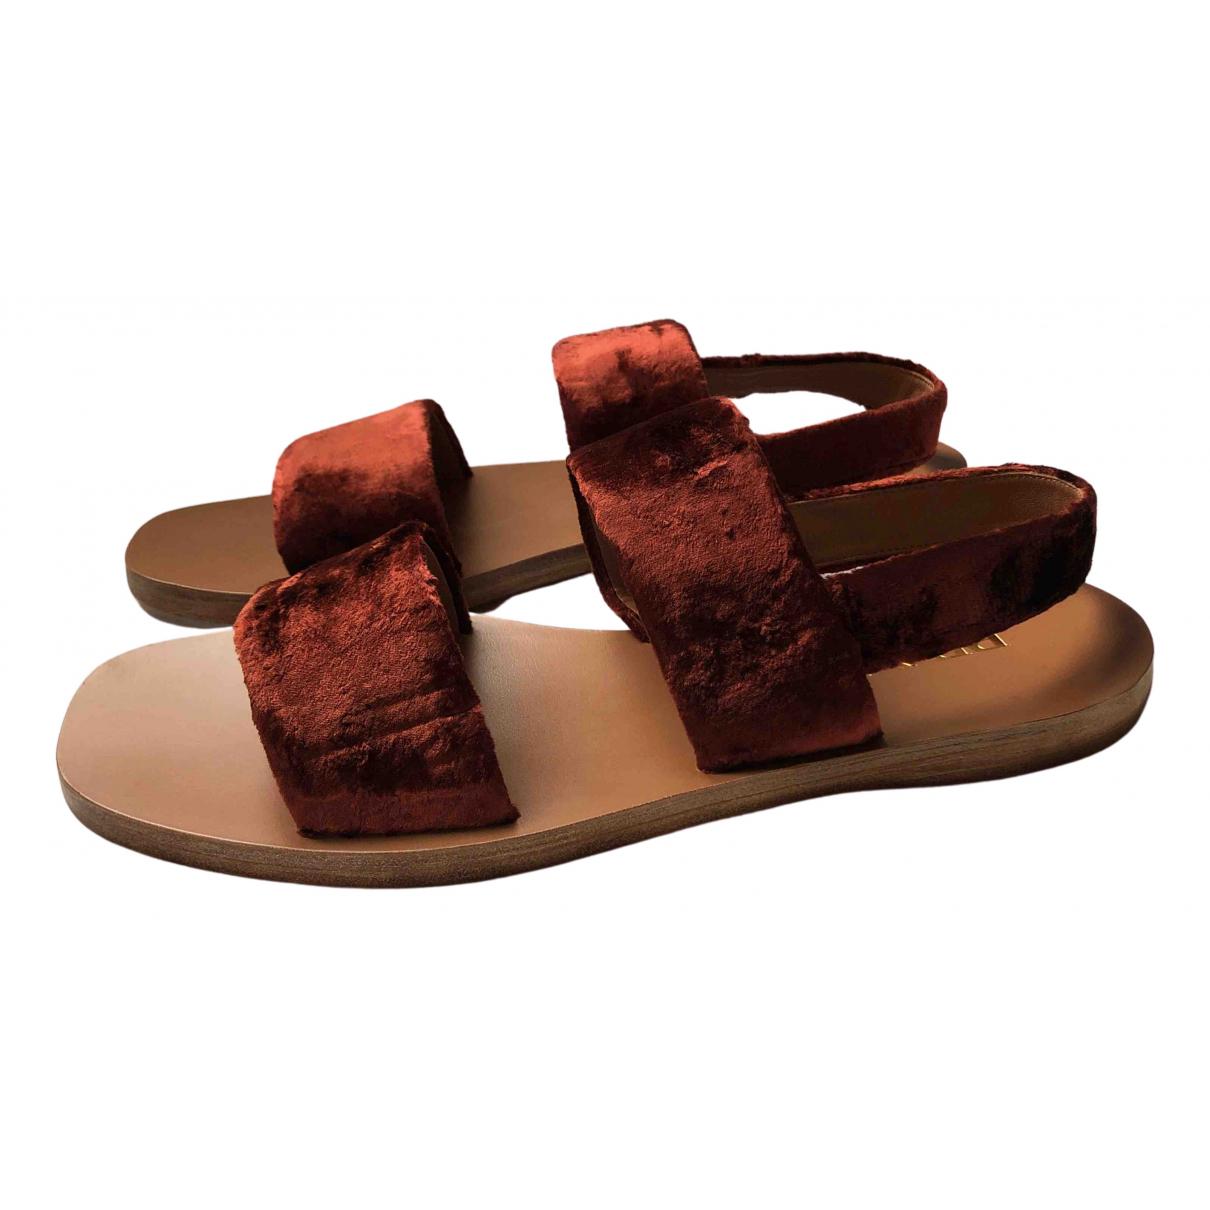 Prada - Sandales   pour femme en velours - marron